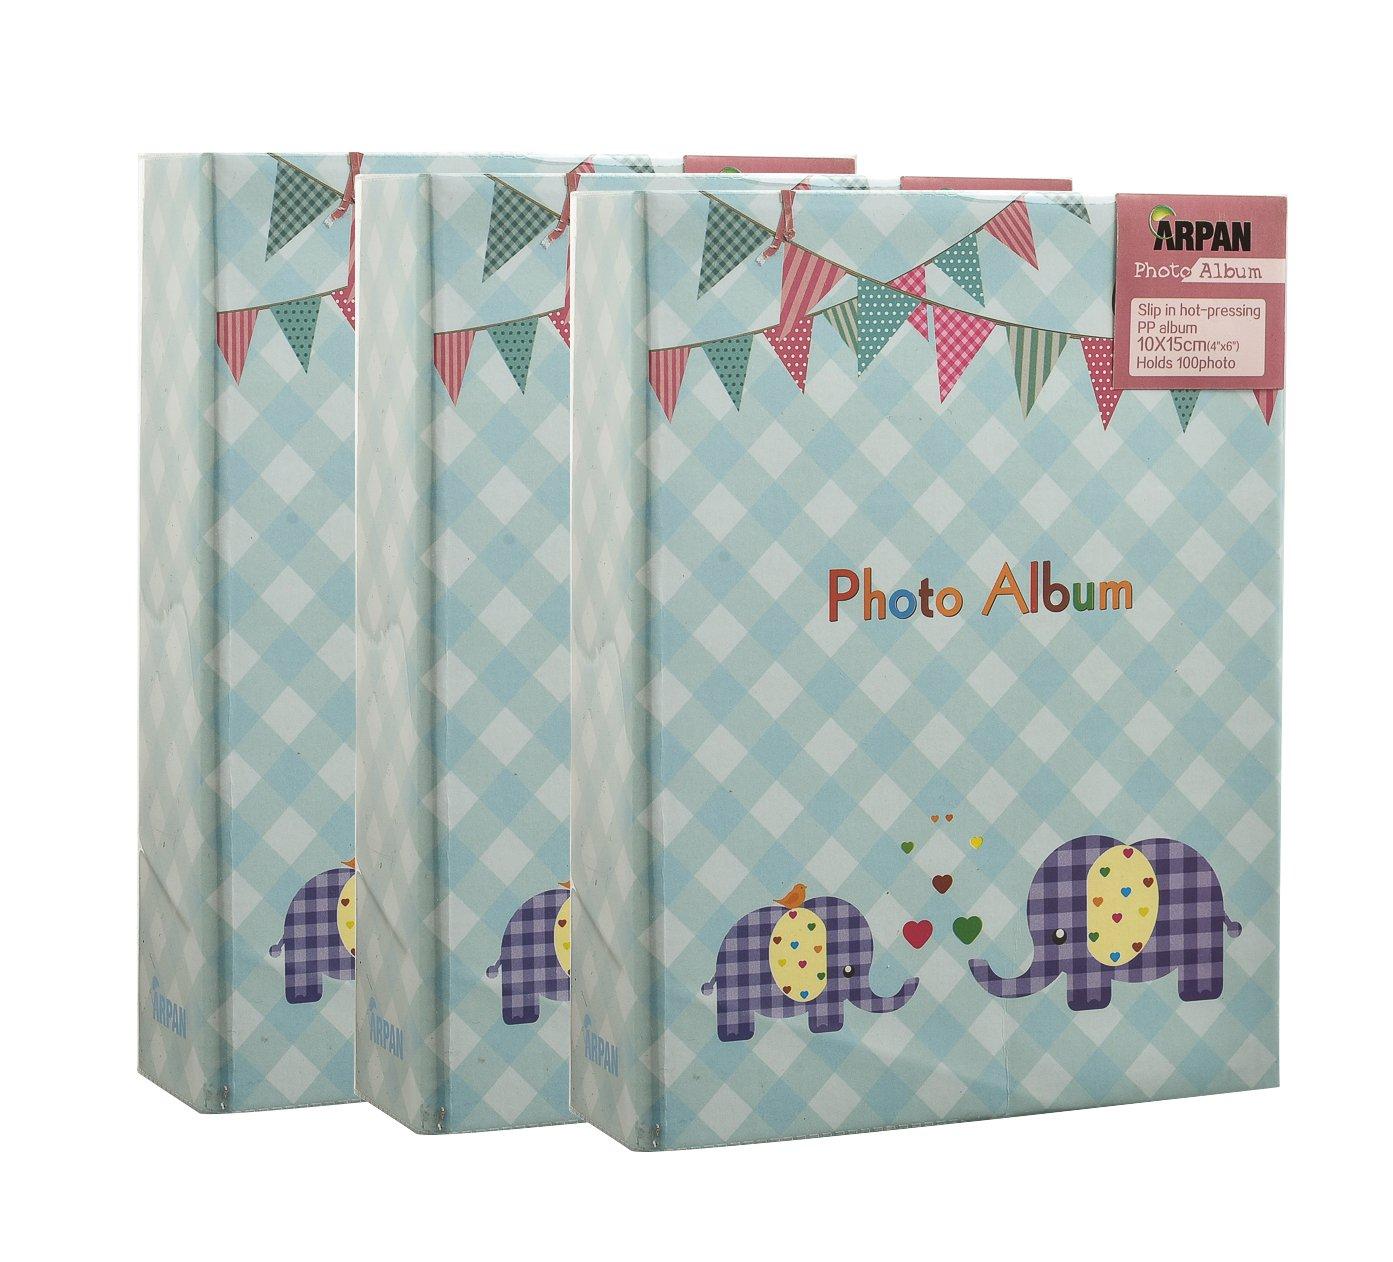 3 x Arpan 6x4'' Blue Baby Boy Slip In Photo Album For 100 Photos- Elephant Kids -Ideal Gift BA-9776-X3